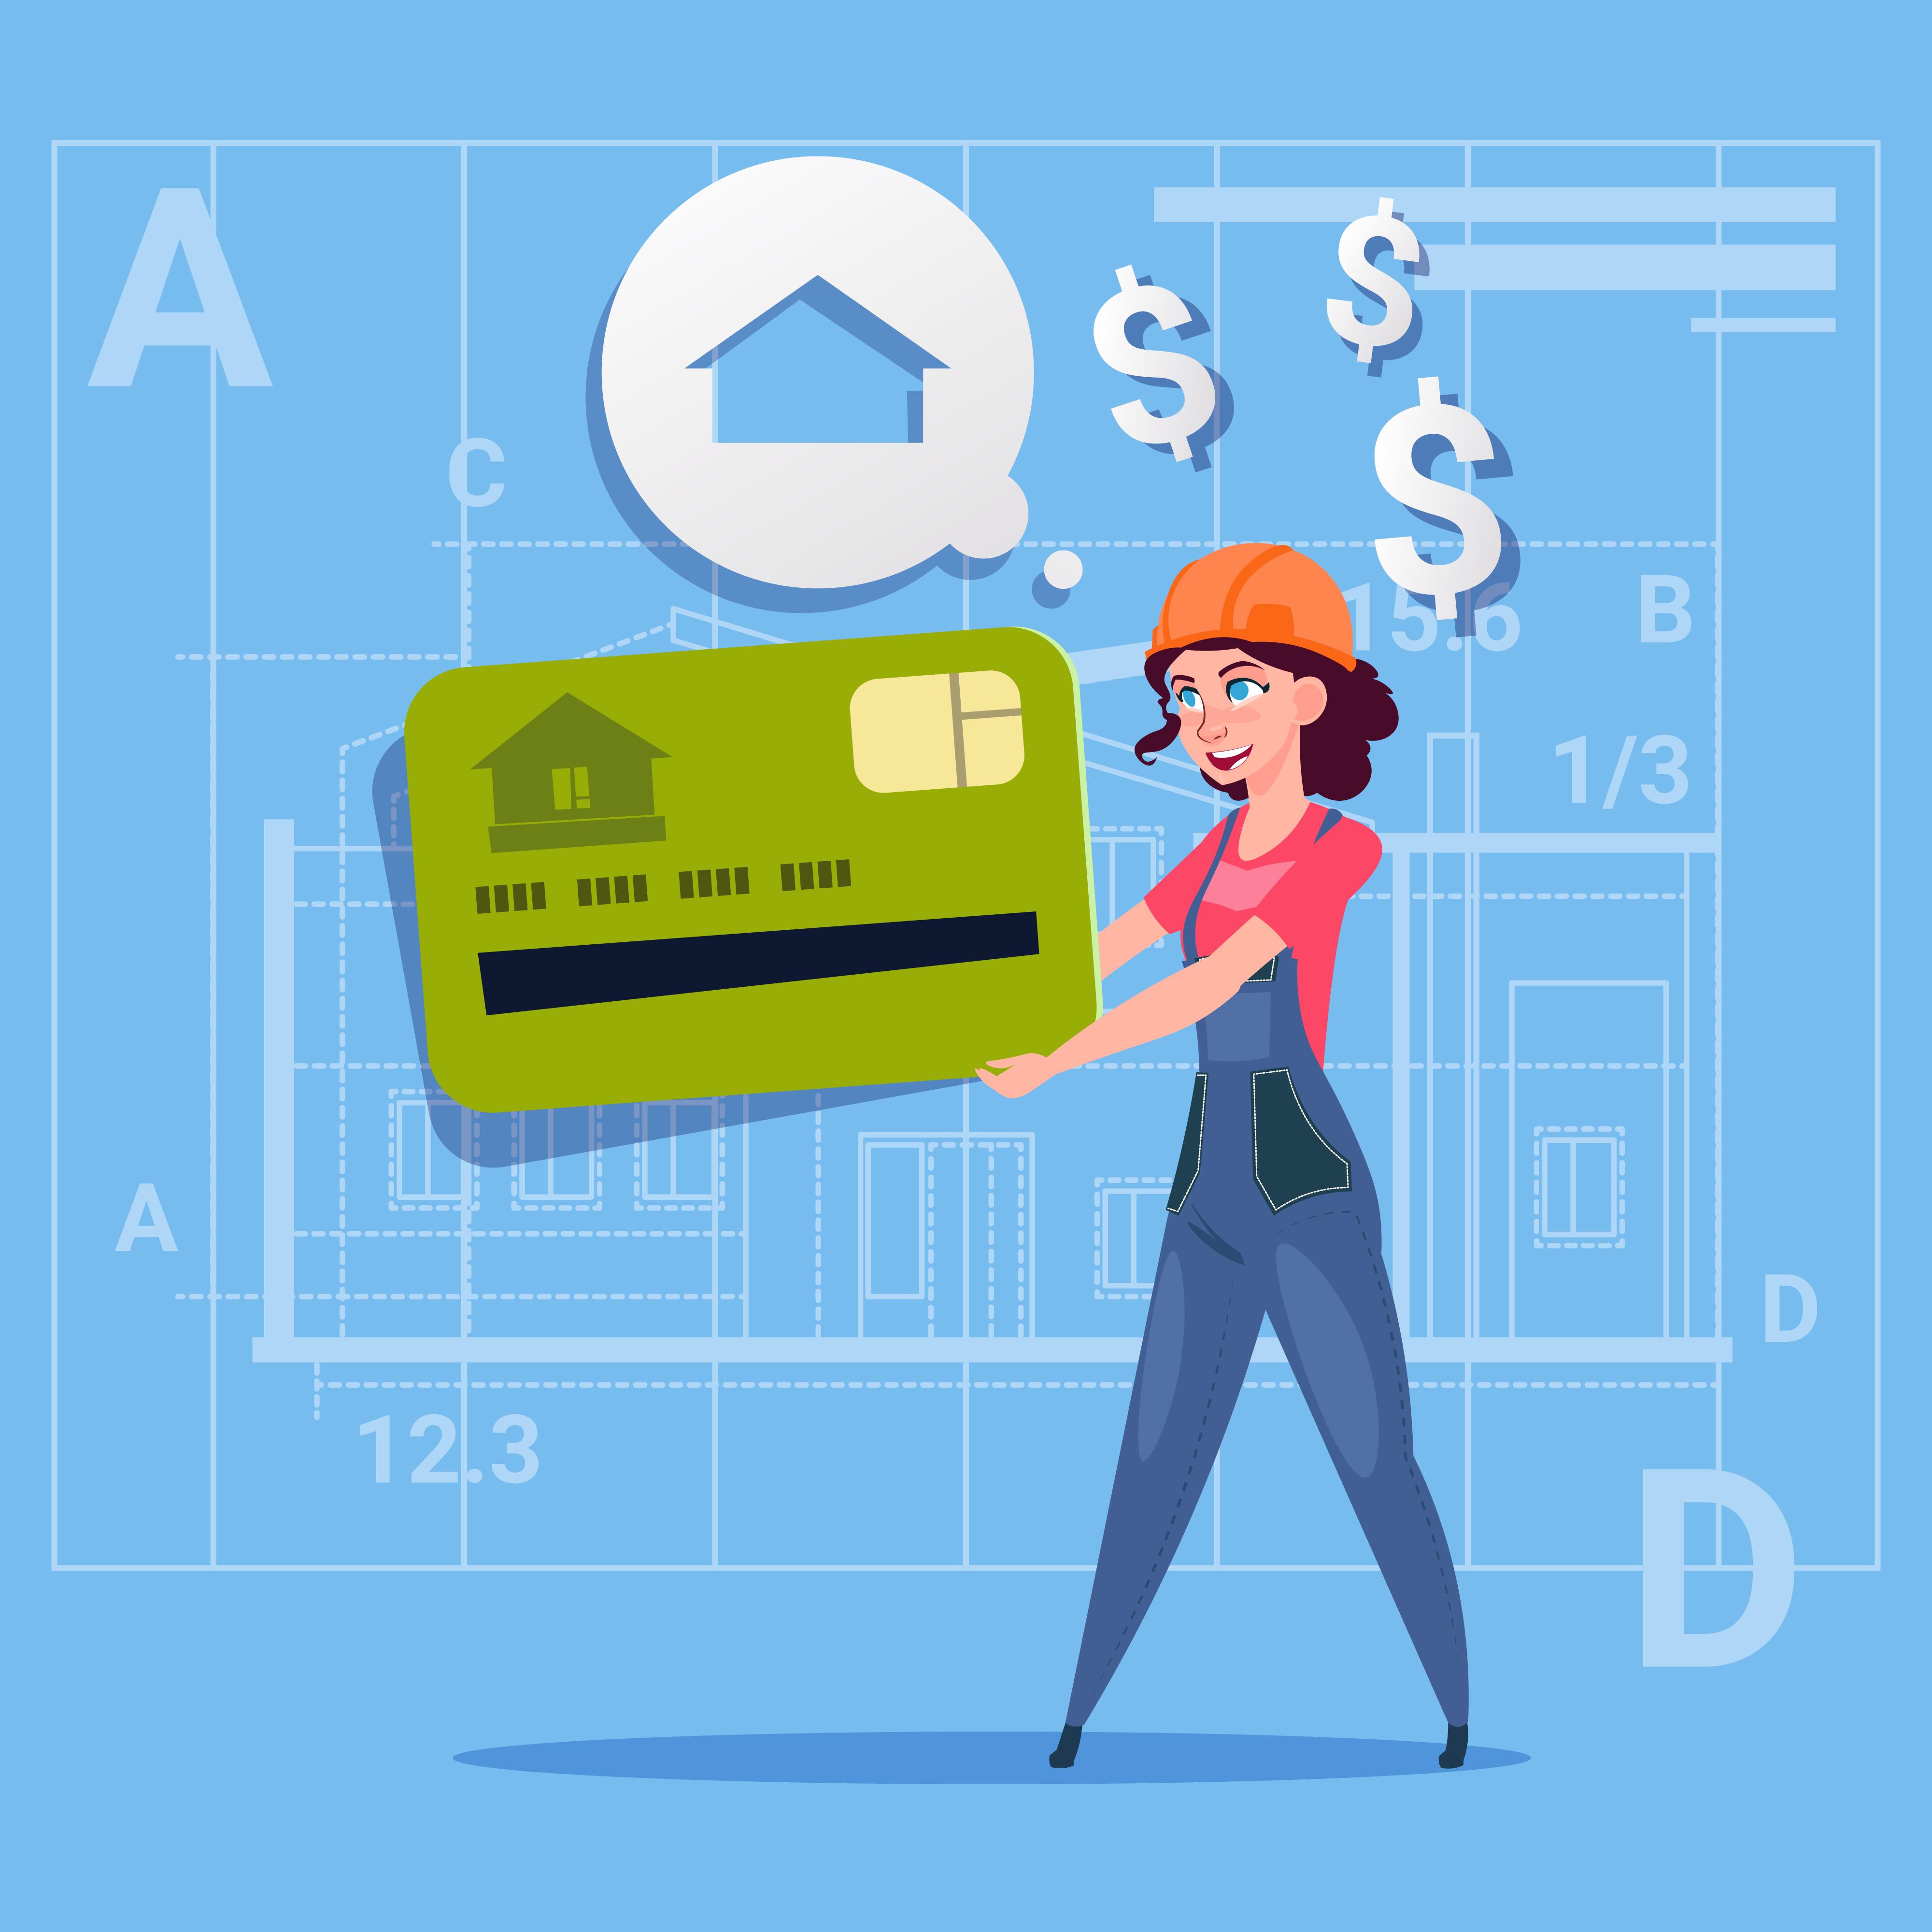 building credit unclaimed money